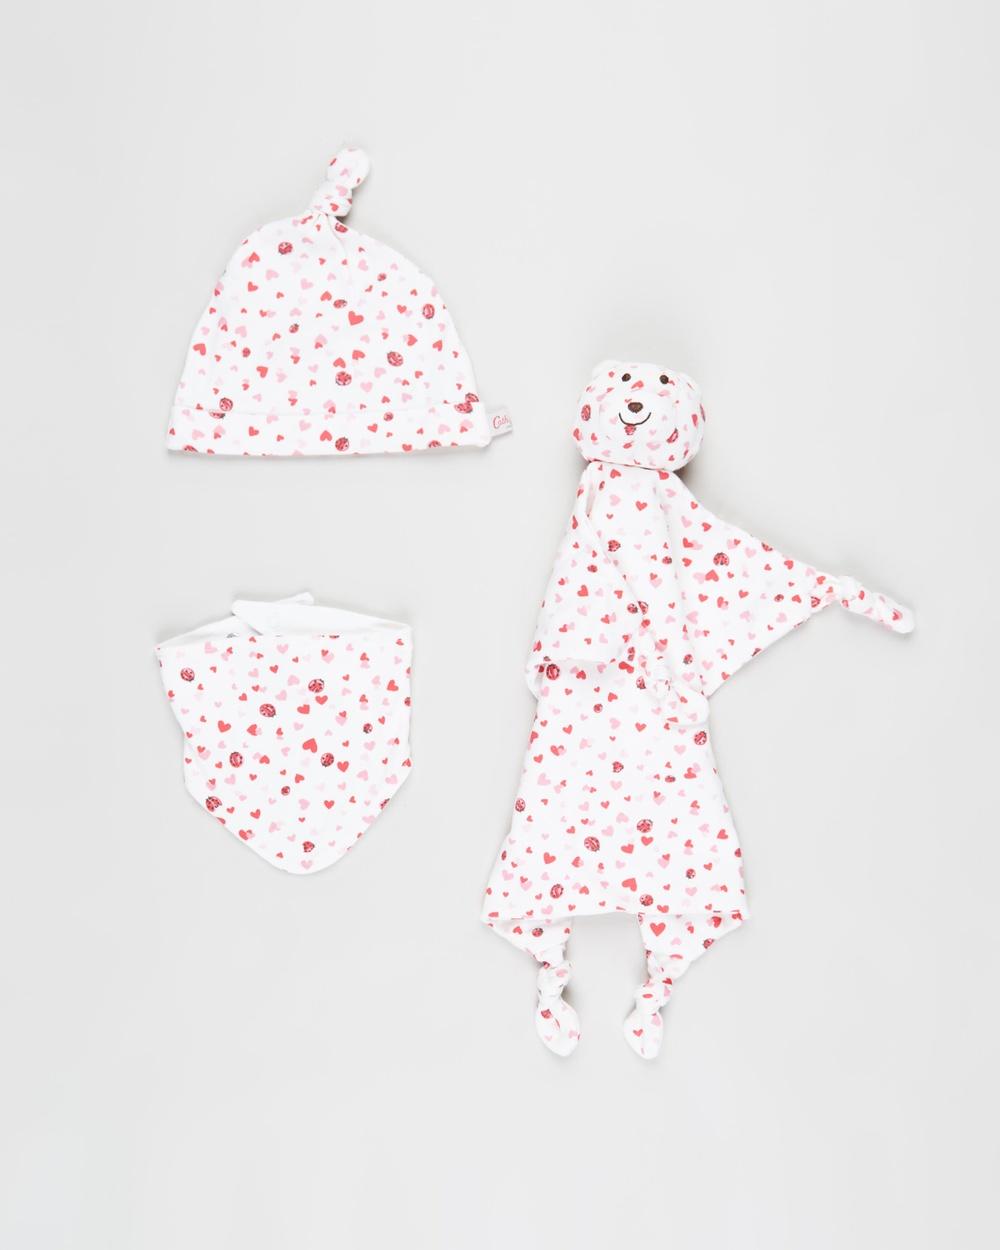 Cath Kidston Baby Accessories Gift Set Bibs Mini Lovebugs